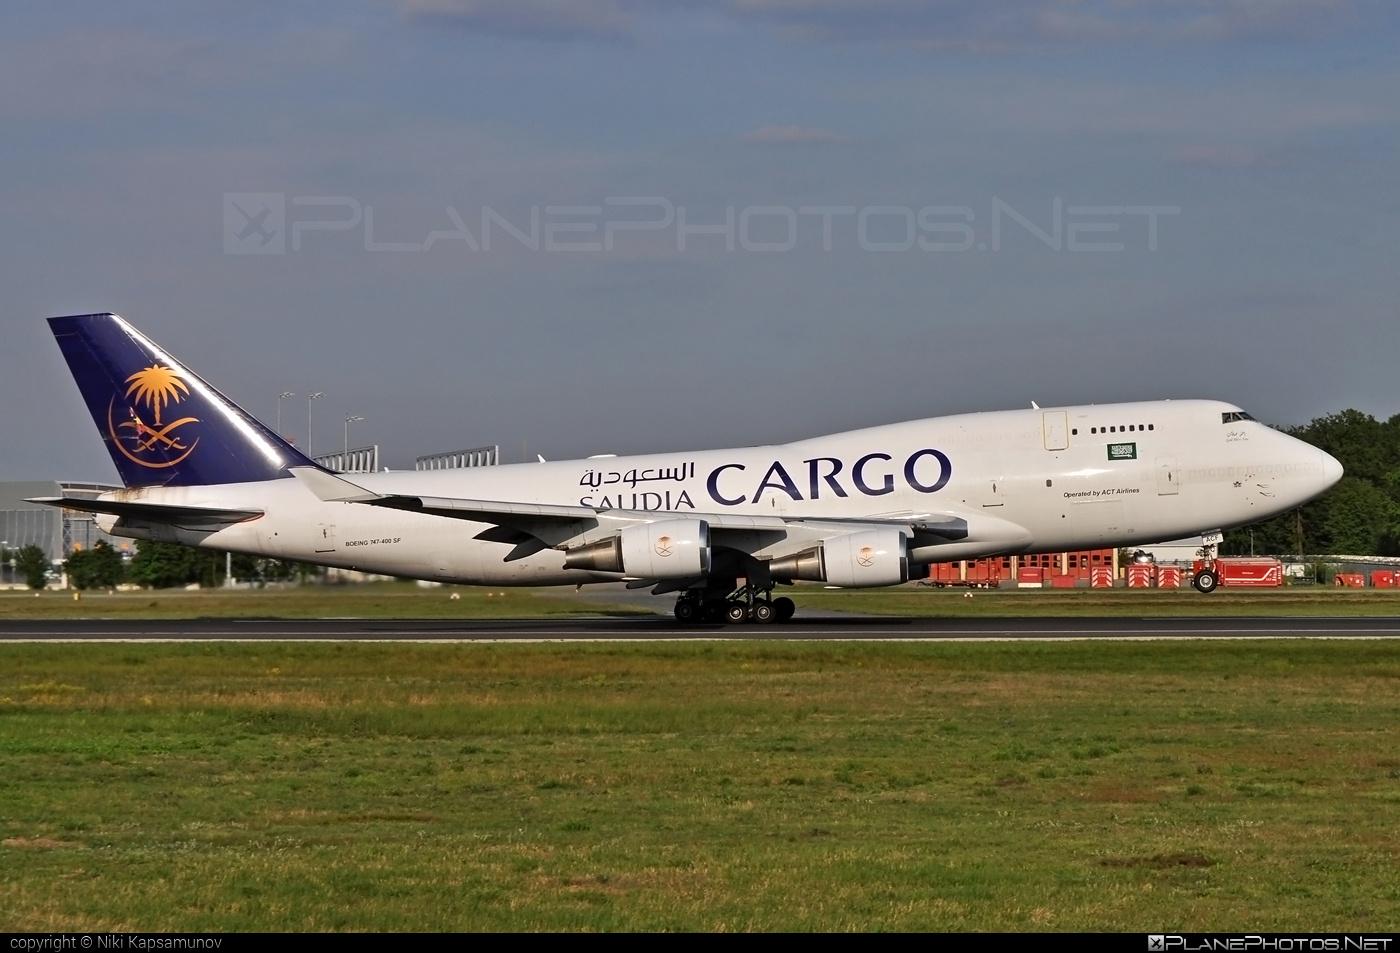 Boeing 747-400SF - TC-ACF operated by Saudi Arabian Airlines Cargo (myCARGO) #b747 #b747sf #boeing #boeing747 #jumbo